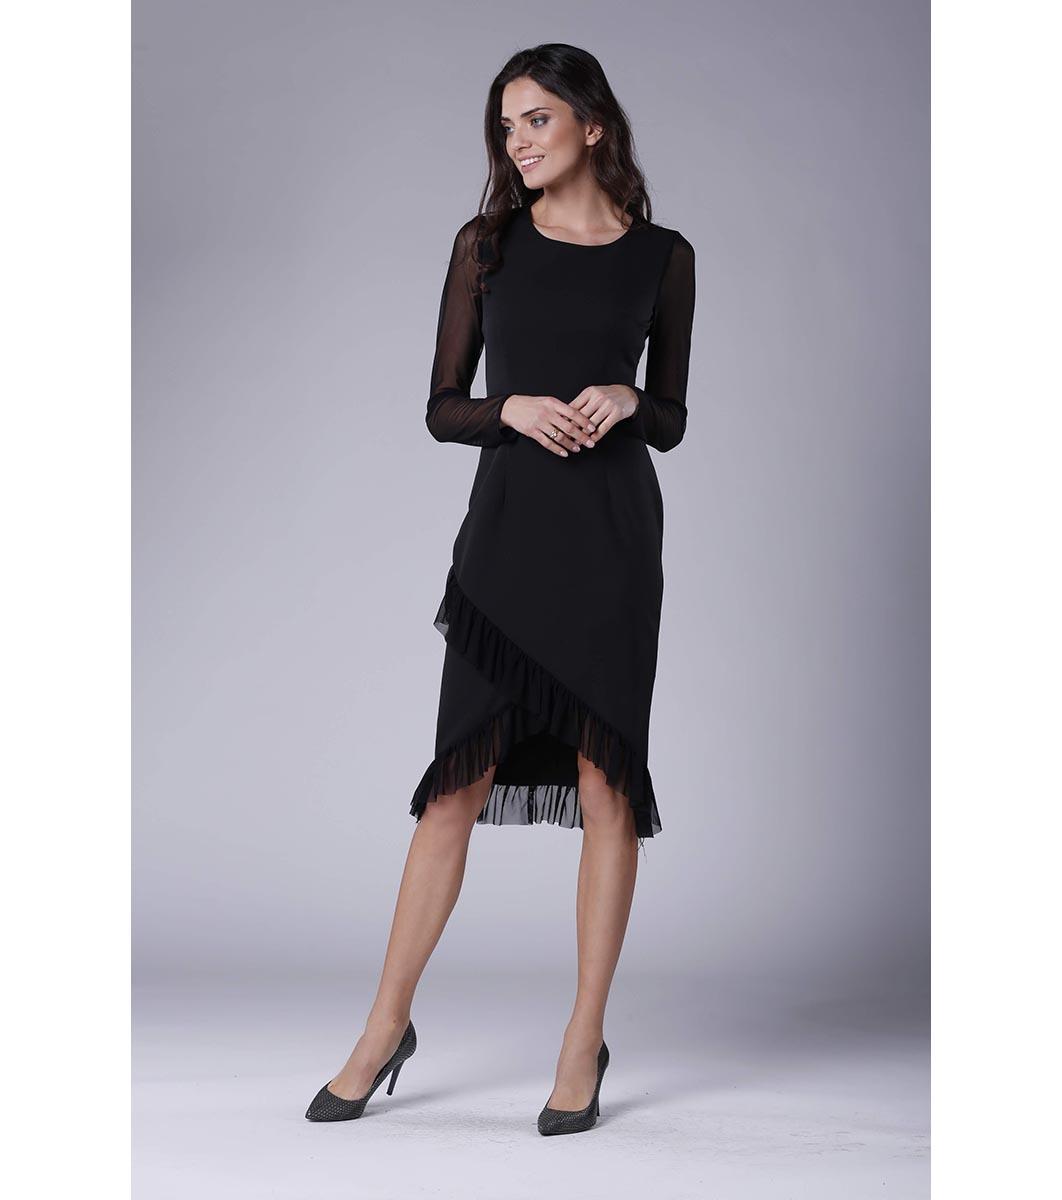 a0ed10fa763 Черна рокля с прозрачни ръкави Mevita - 2220540 - Fashion Supreme.co.uk